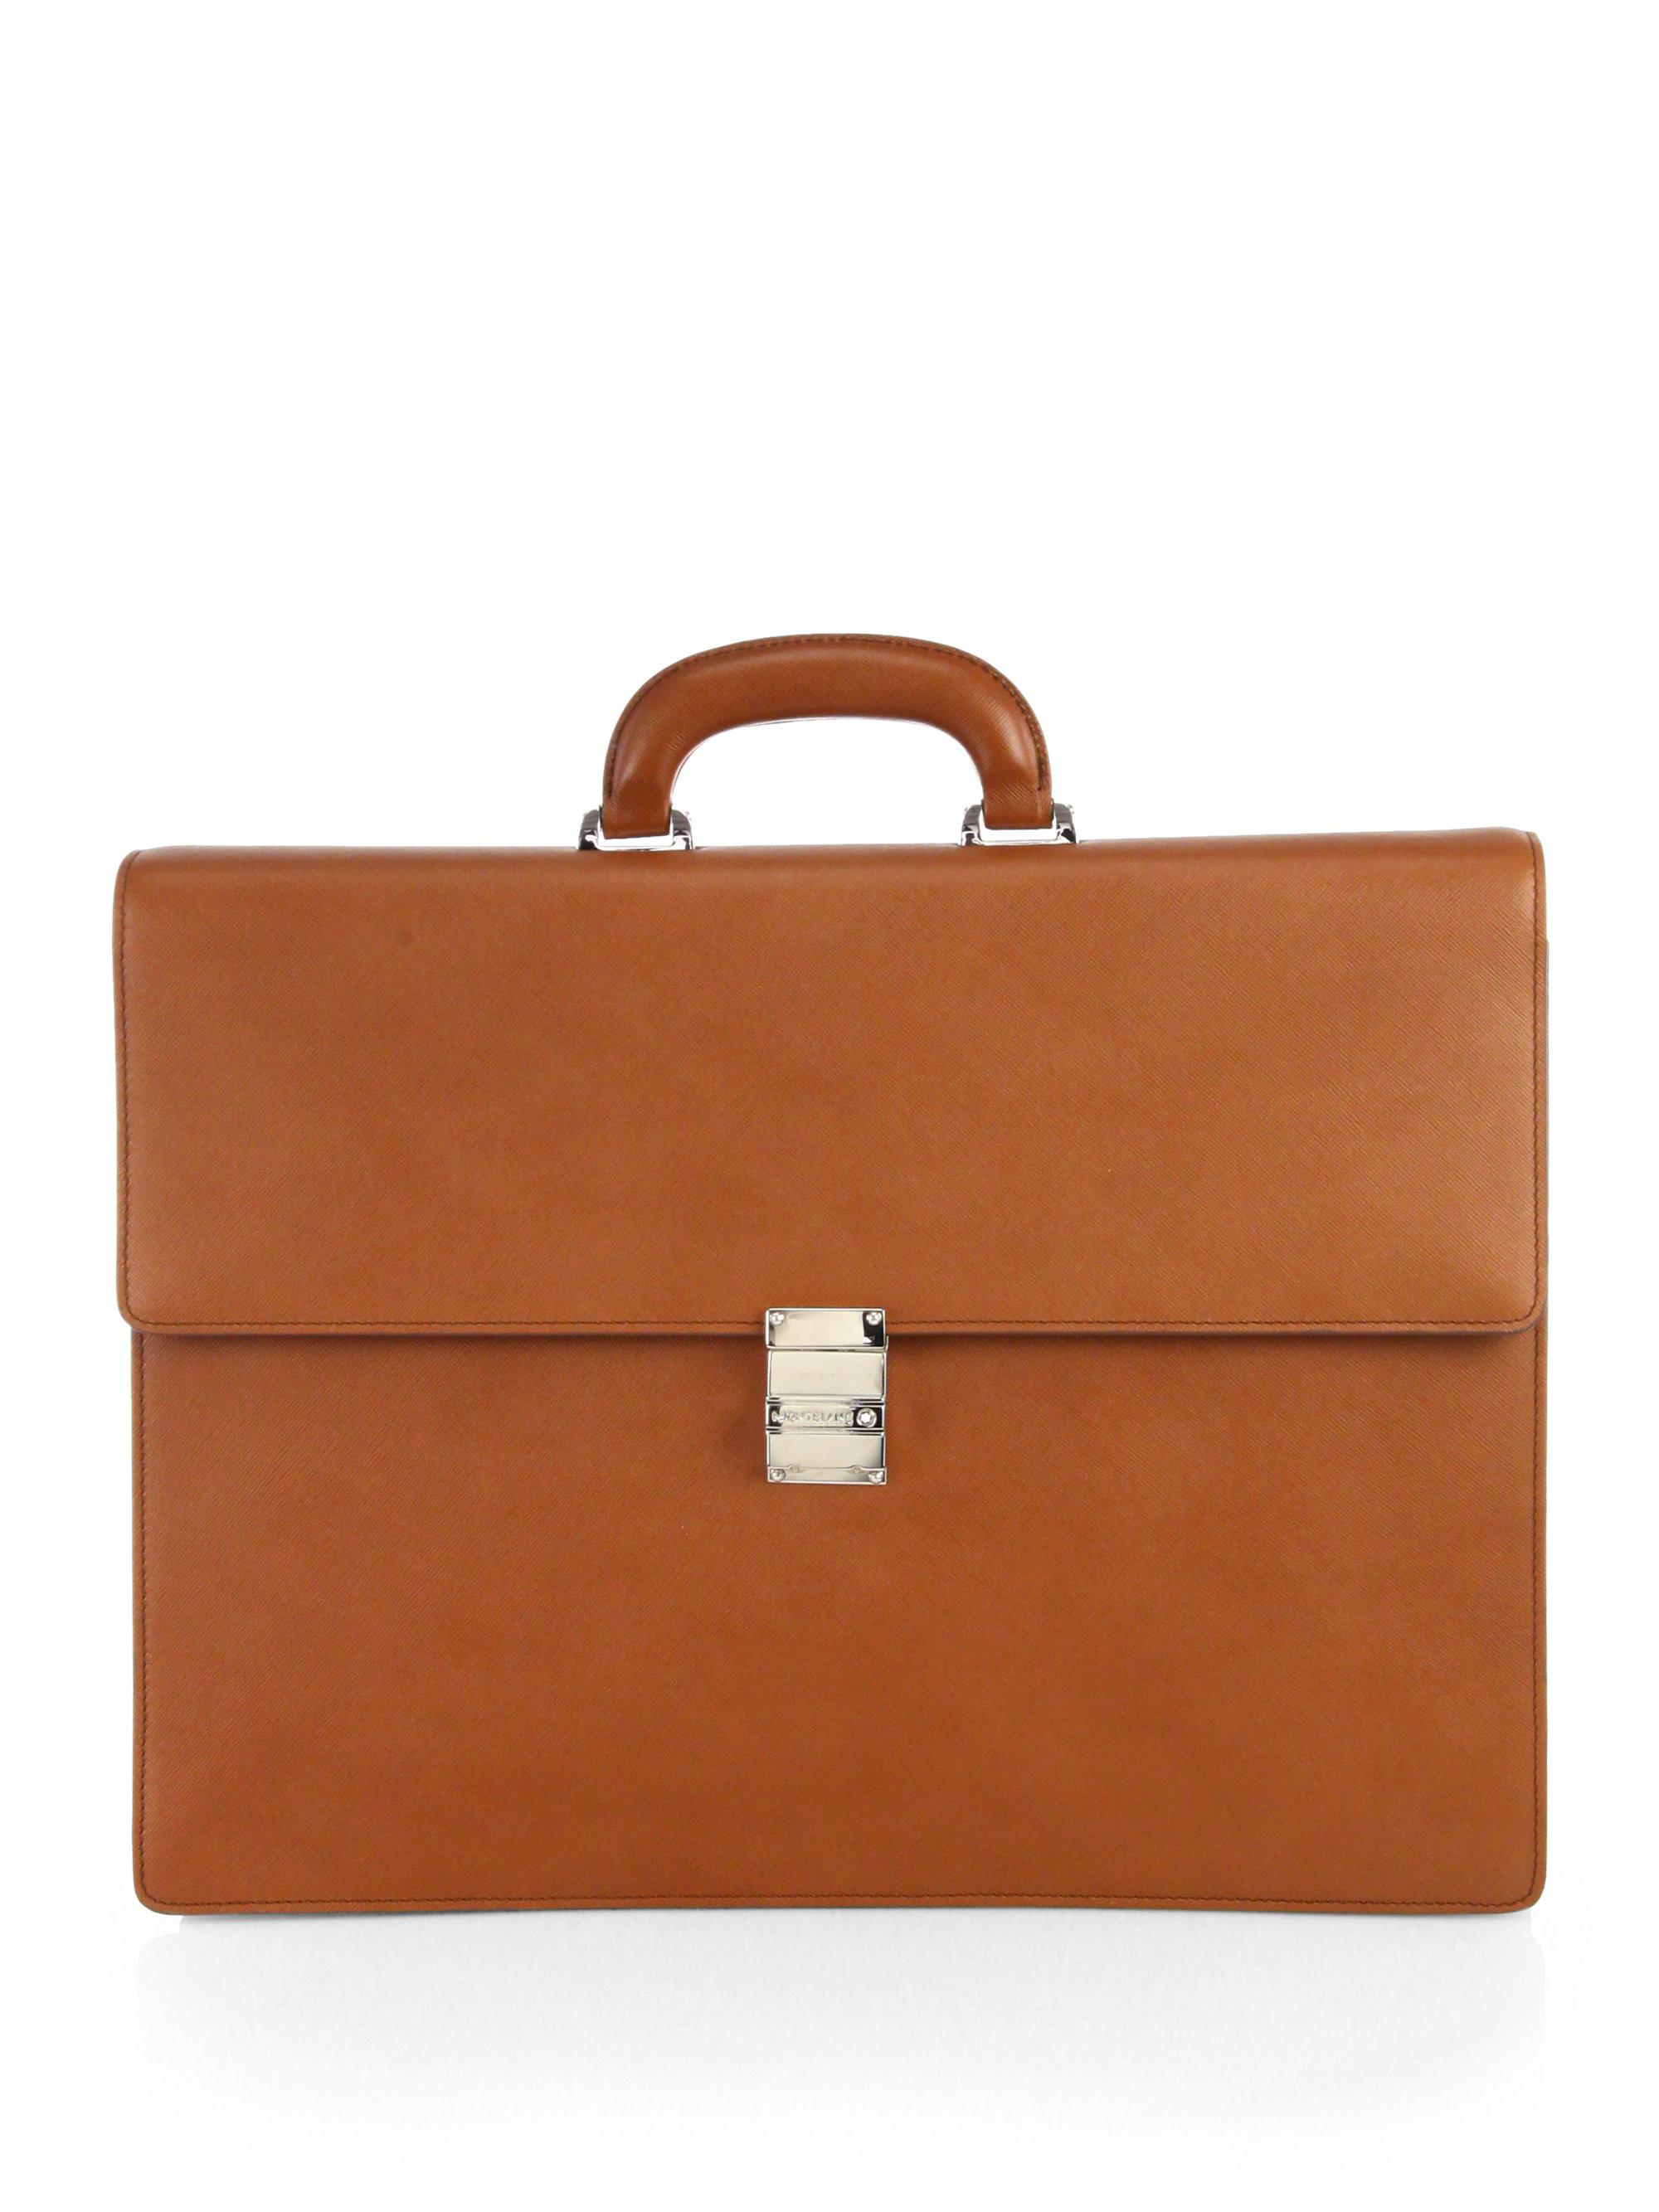 brown briefcase photo - 1